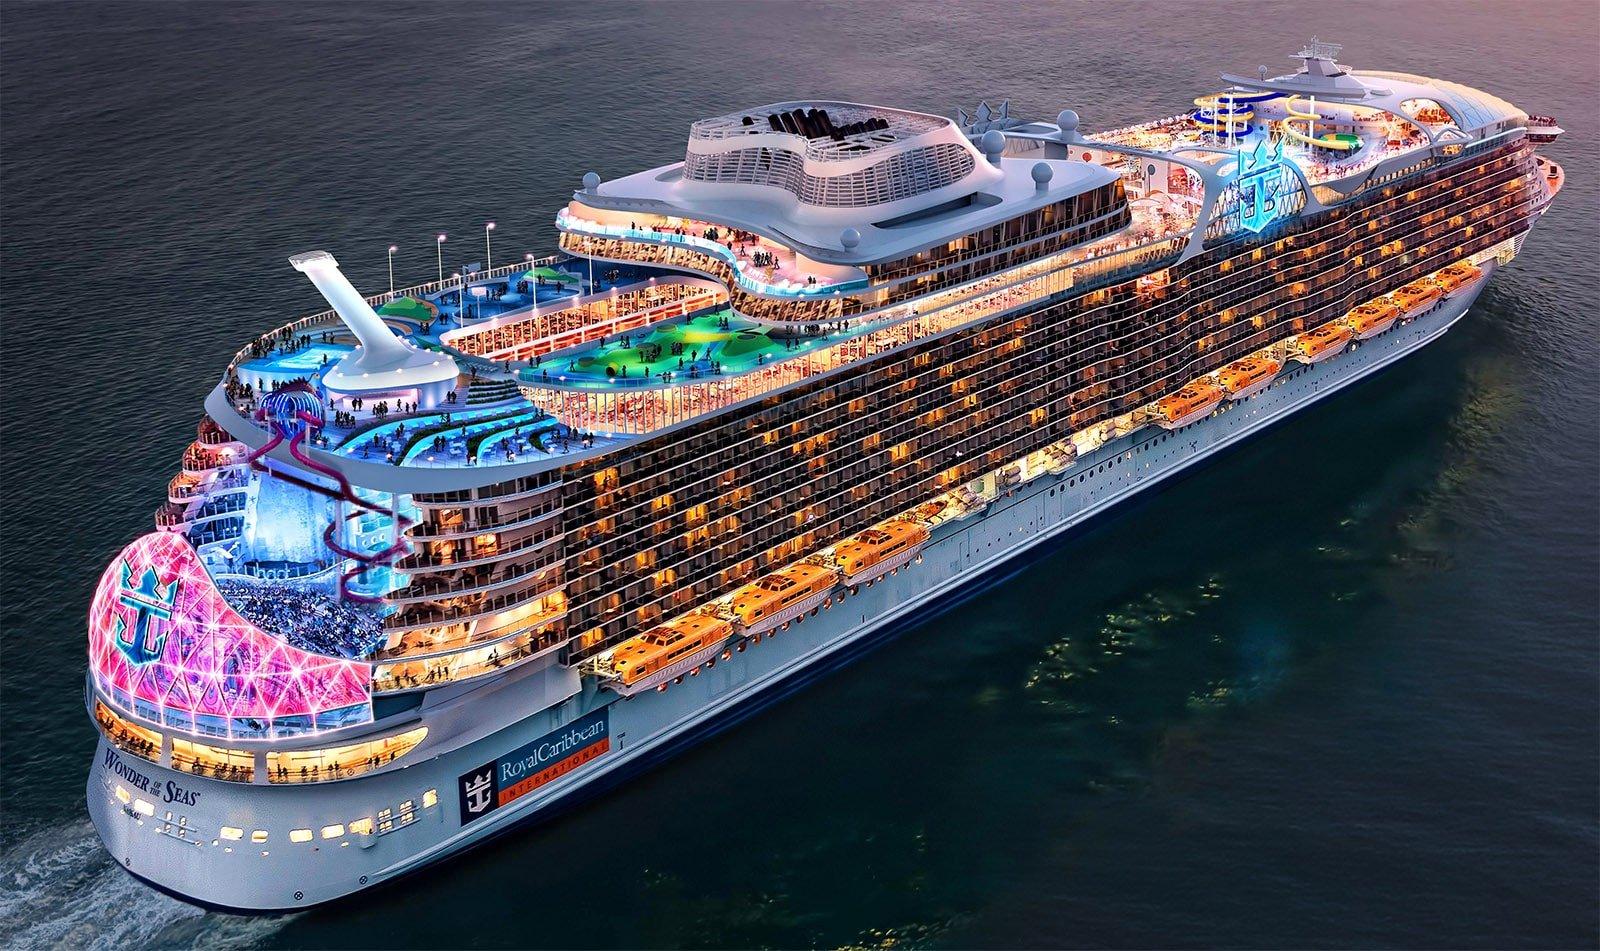 Royal Caribbean delays new Oasis Class ship arrival in 2021 | Royal  Caribbean Blog